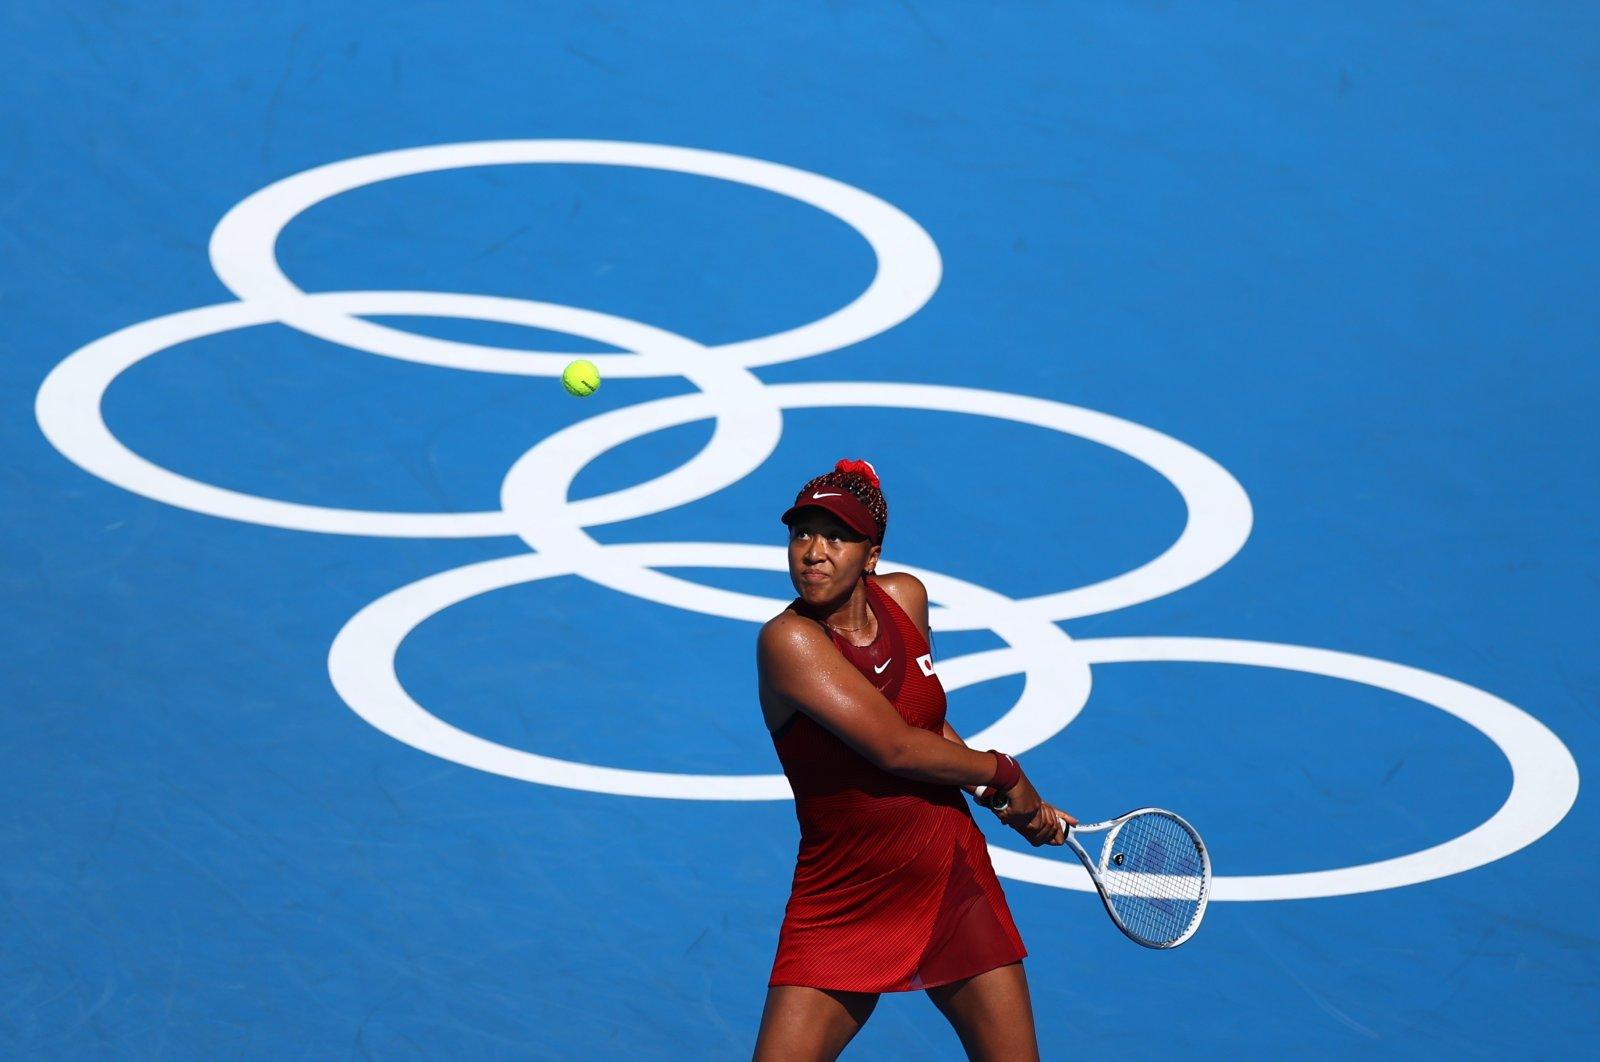 Japan's Naomi Osaka in action during her Tokyo Olympics first-round match against China's Zheng Saisai, Ariake Tennis Park, Tokyo, Japan, July 25, 2021. (Reuters Photo)